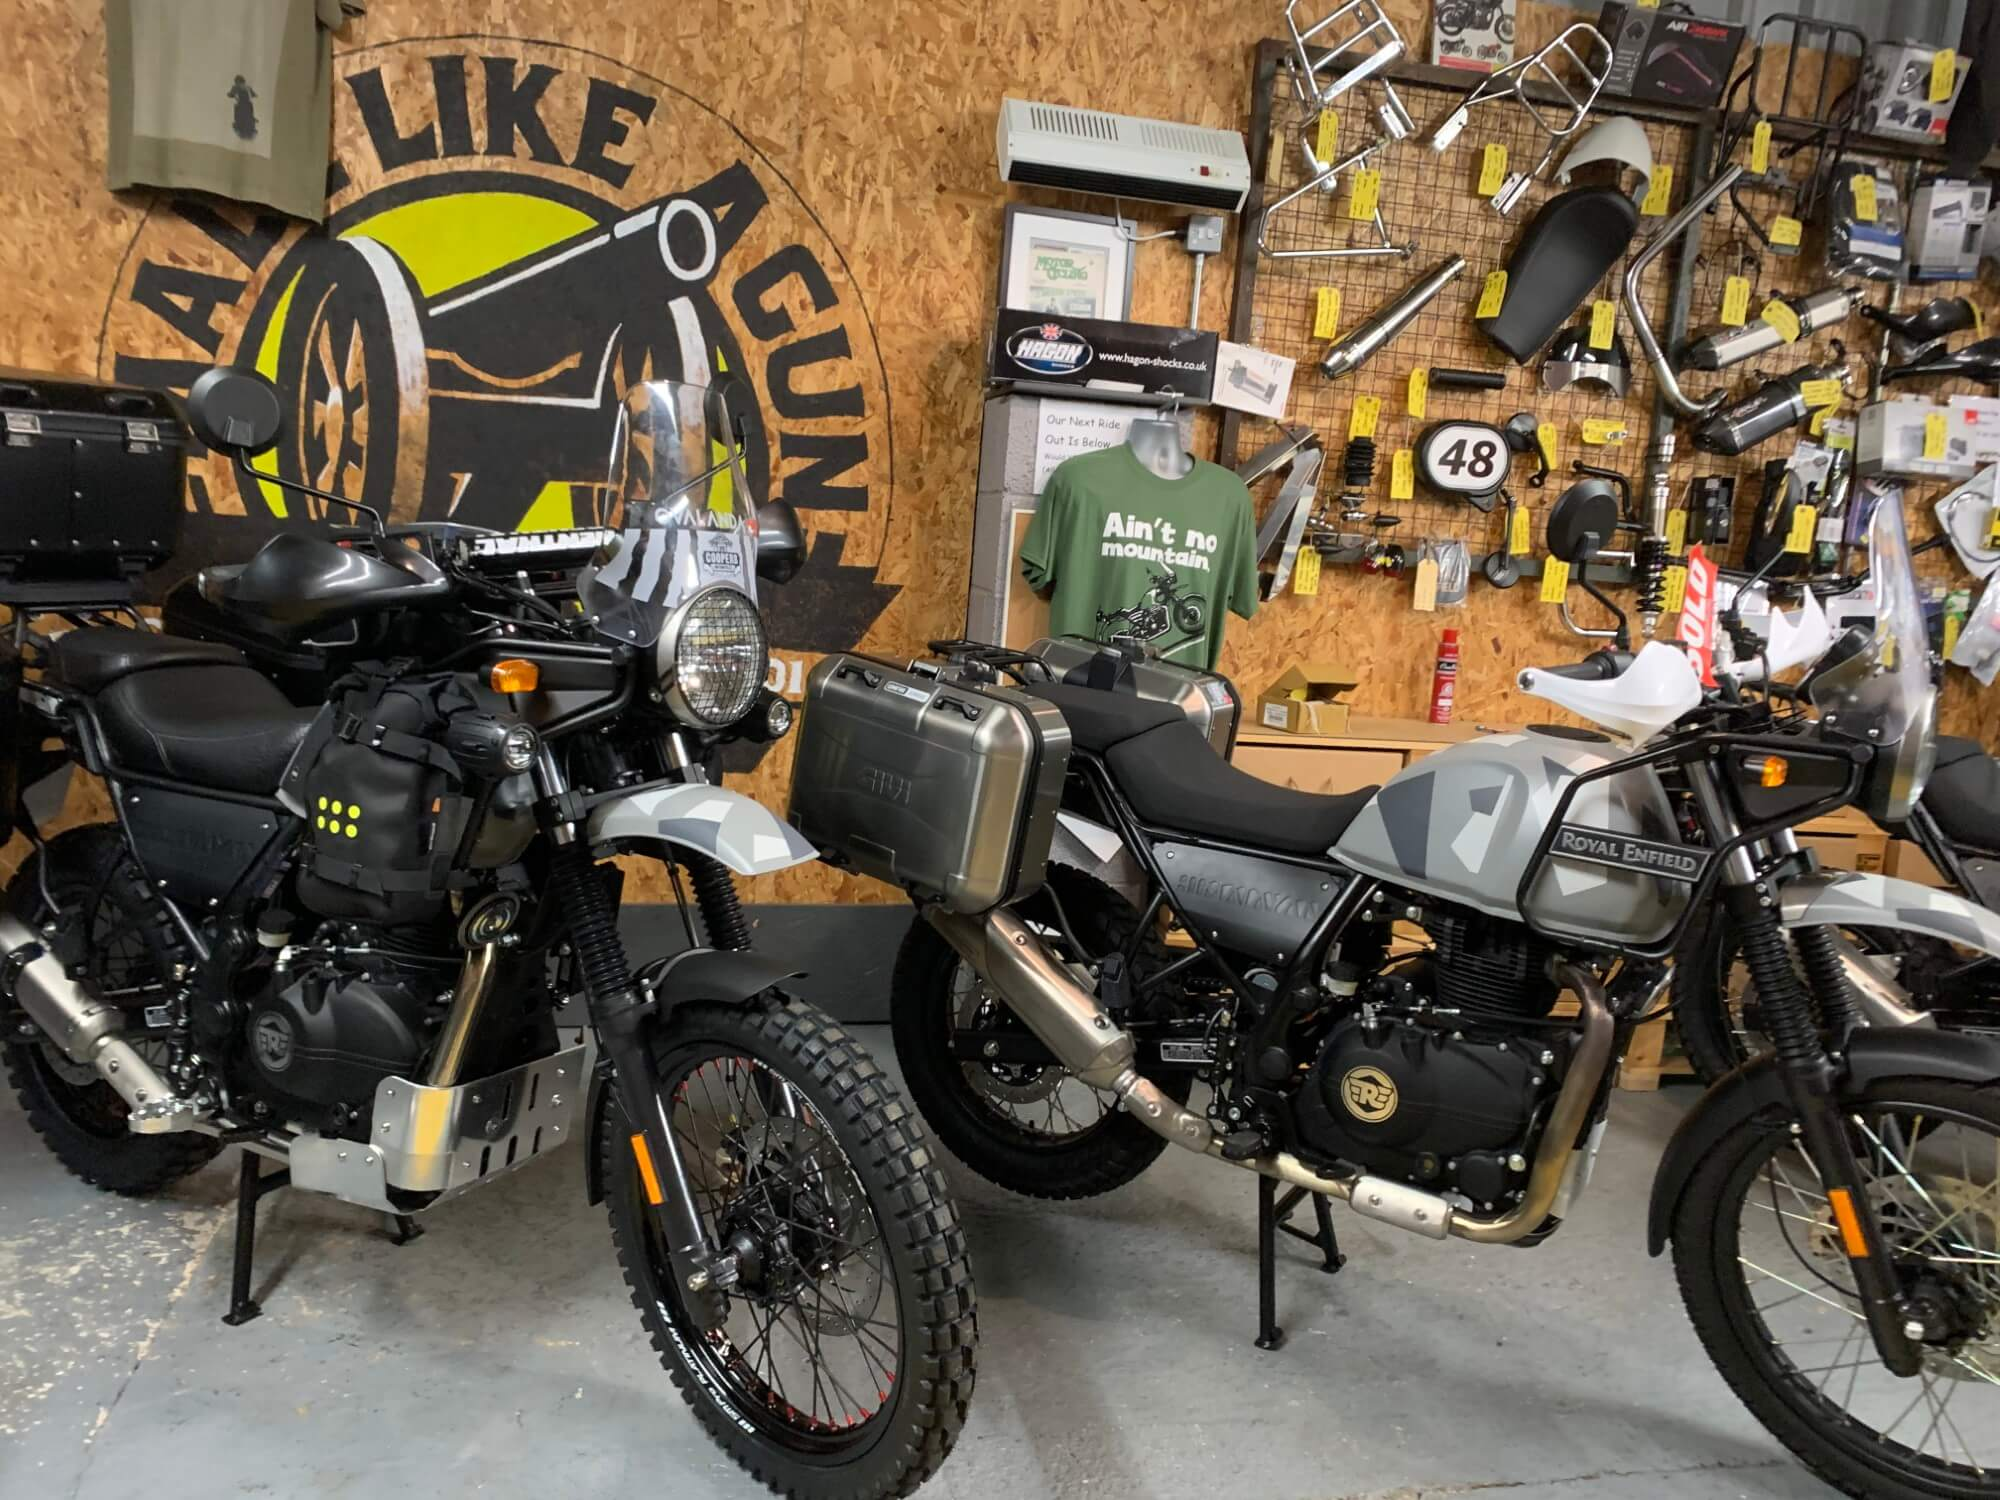 Img 1698 (custom) - COOPERB MOTORCYCLES